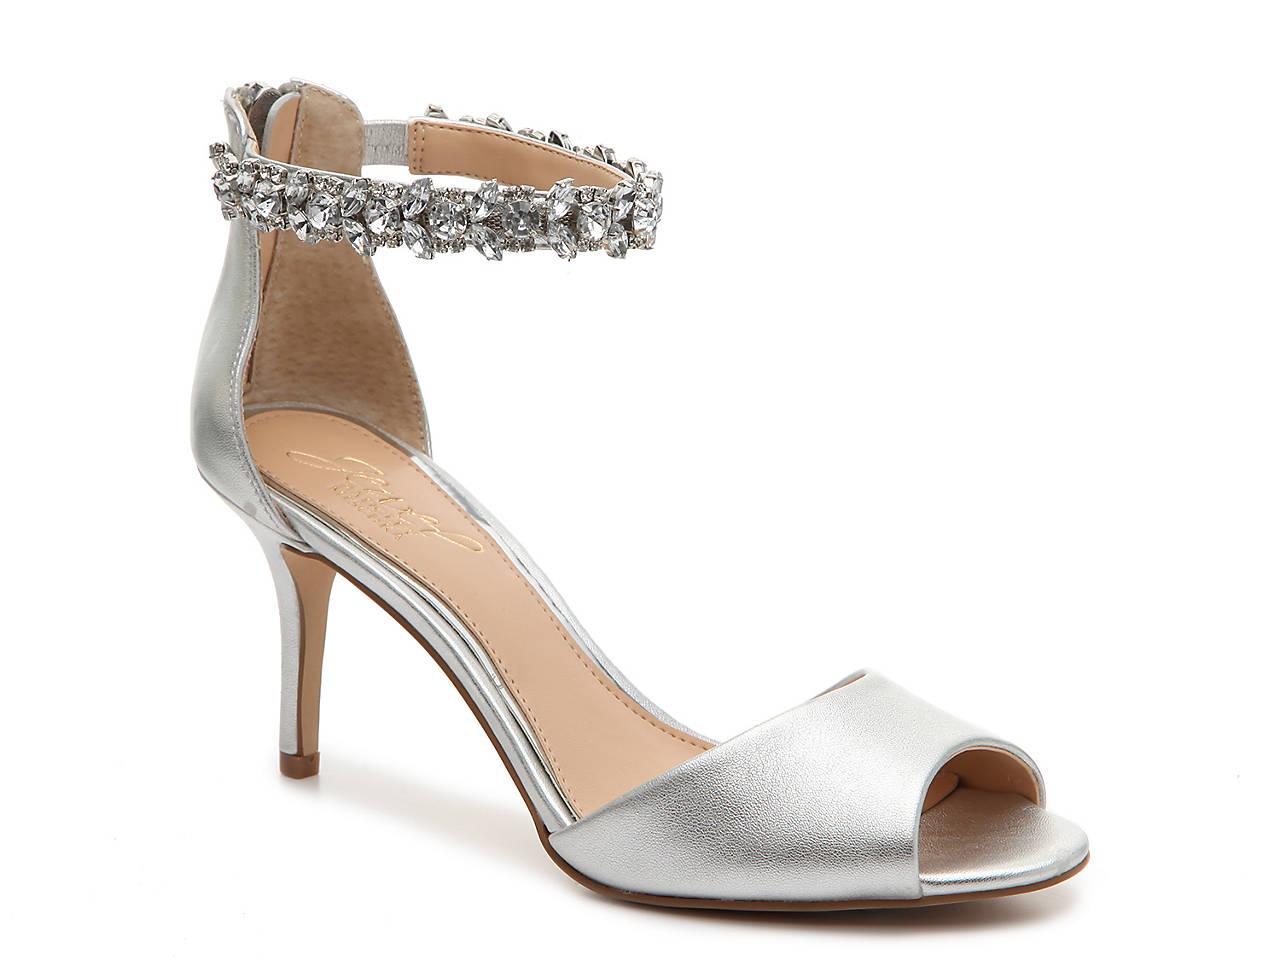 ba4f0f2b5a14 Jewel Badgley Mischka Genevieve Sandal Women s Shoes